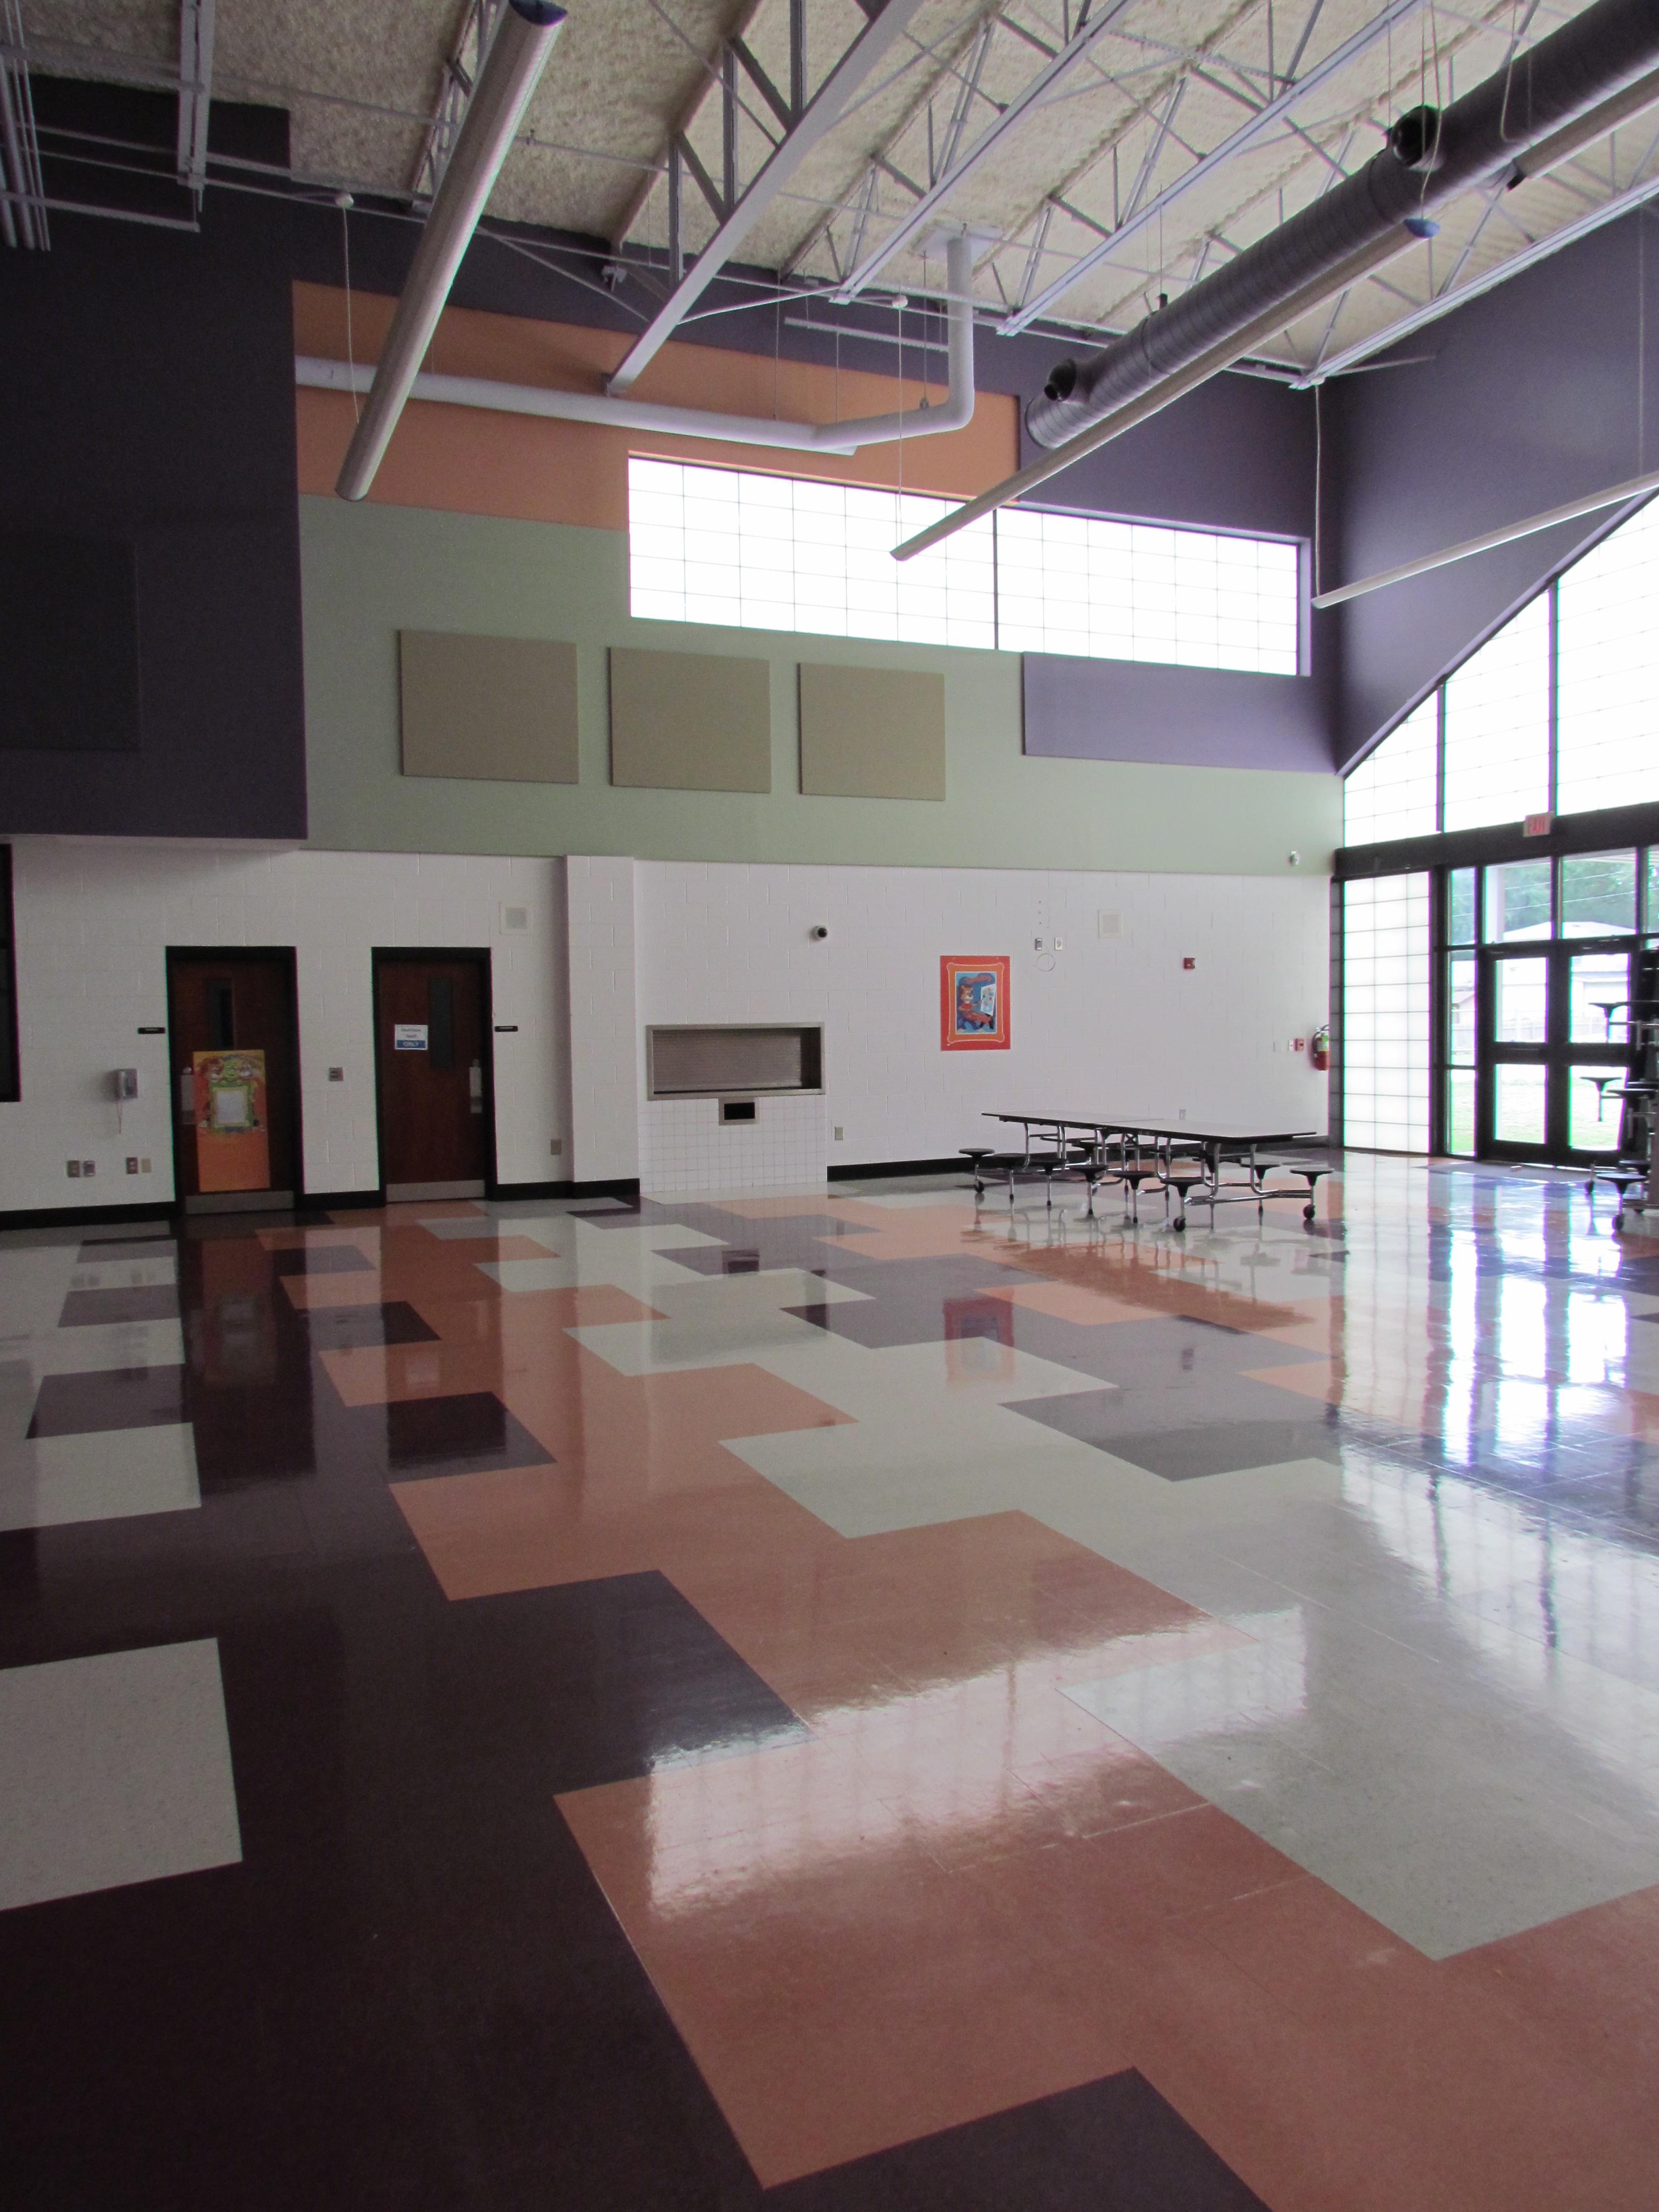 Nichols Elementary Cafeteria